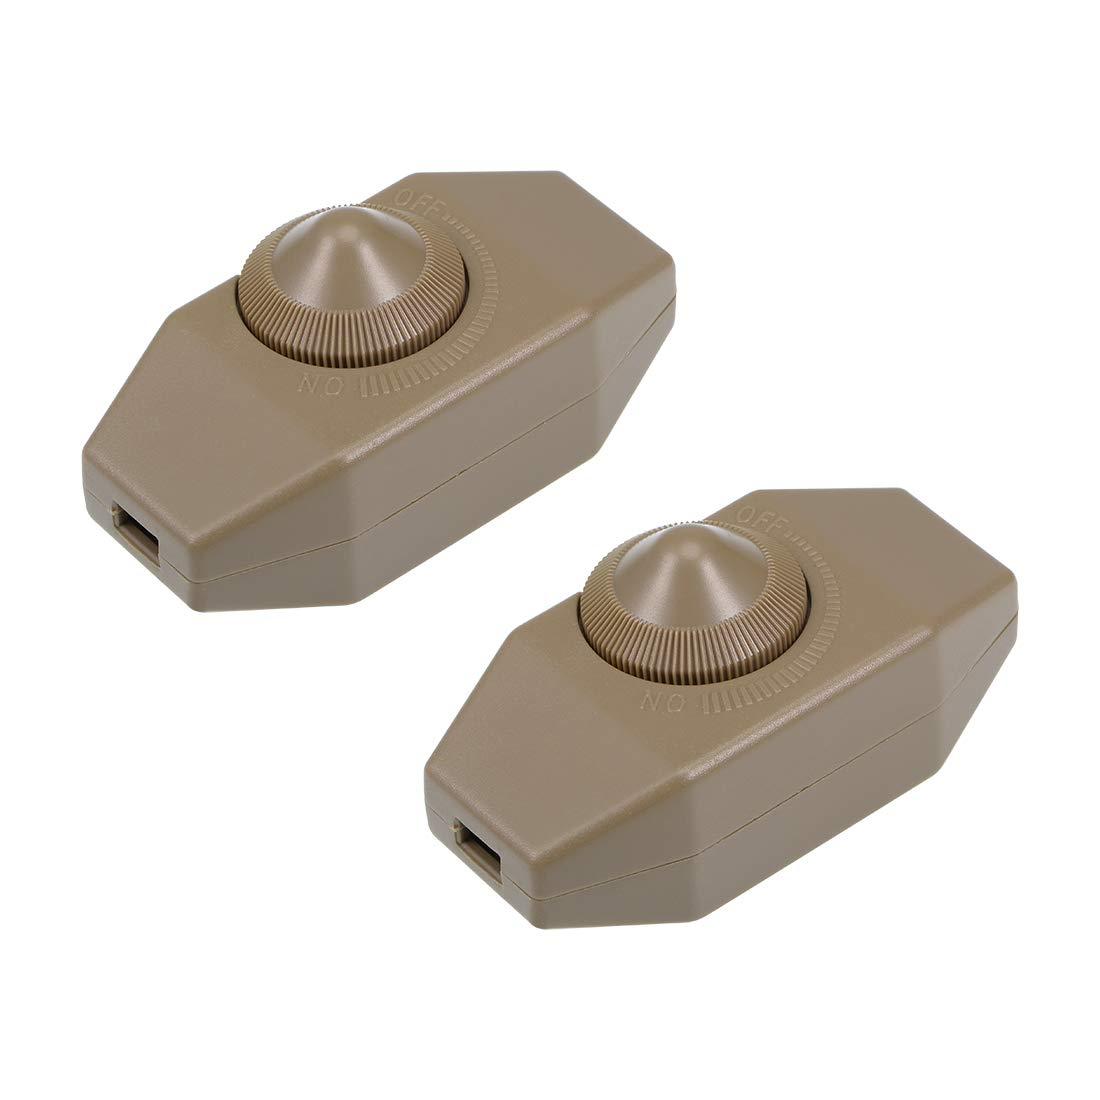 sourcing map Interruptor de cable giratorio AC 250V 2A Regulador de control deslizante de l/ámpara de 100 vatios Blanco